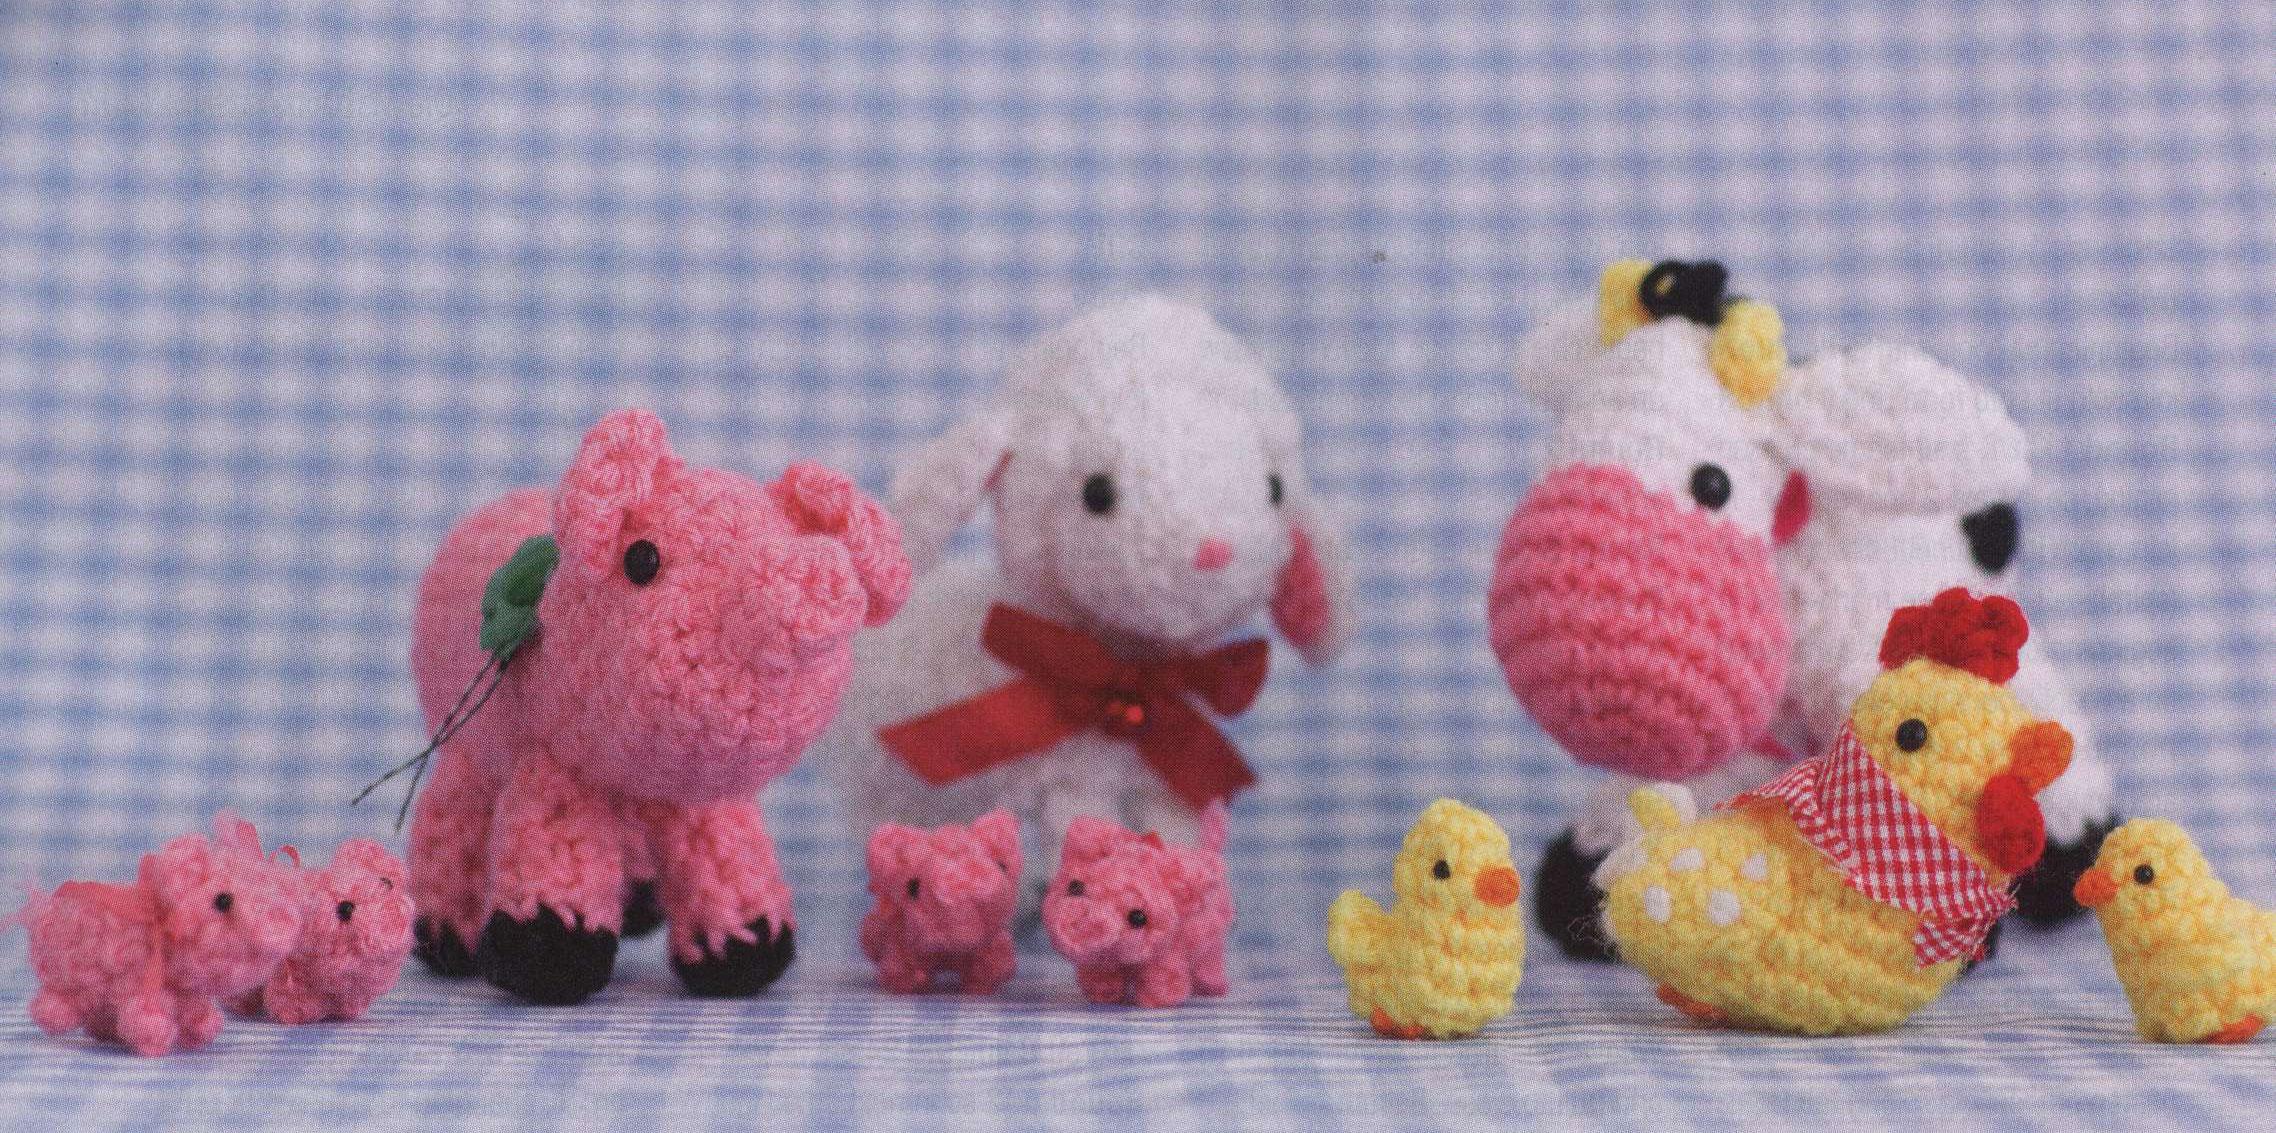 Crochet Farm Animals Amigurumi Crochet Kingdom